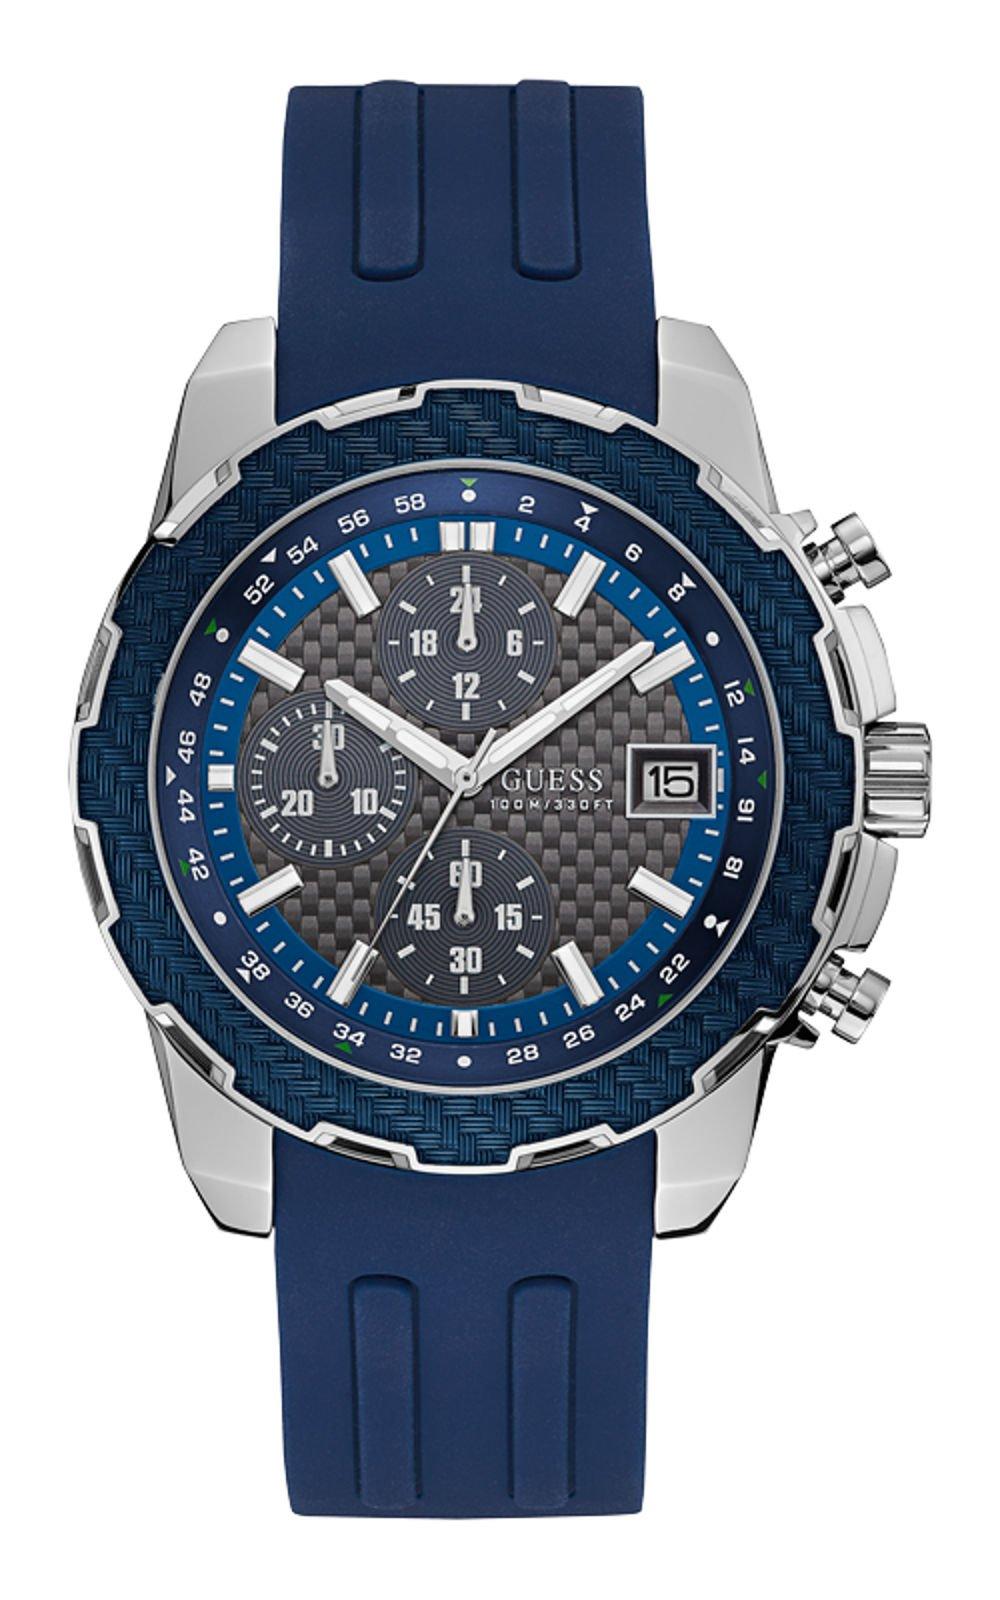 GUESS W1047G2 Ανδρικό Ρολόι Quartz Χρονογράφος Ακριβείας ab149315344